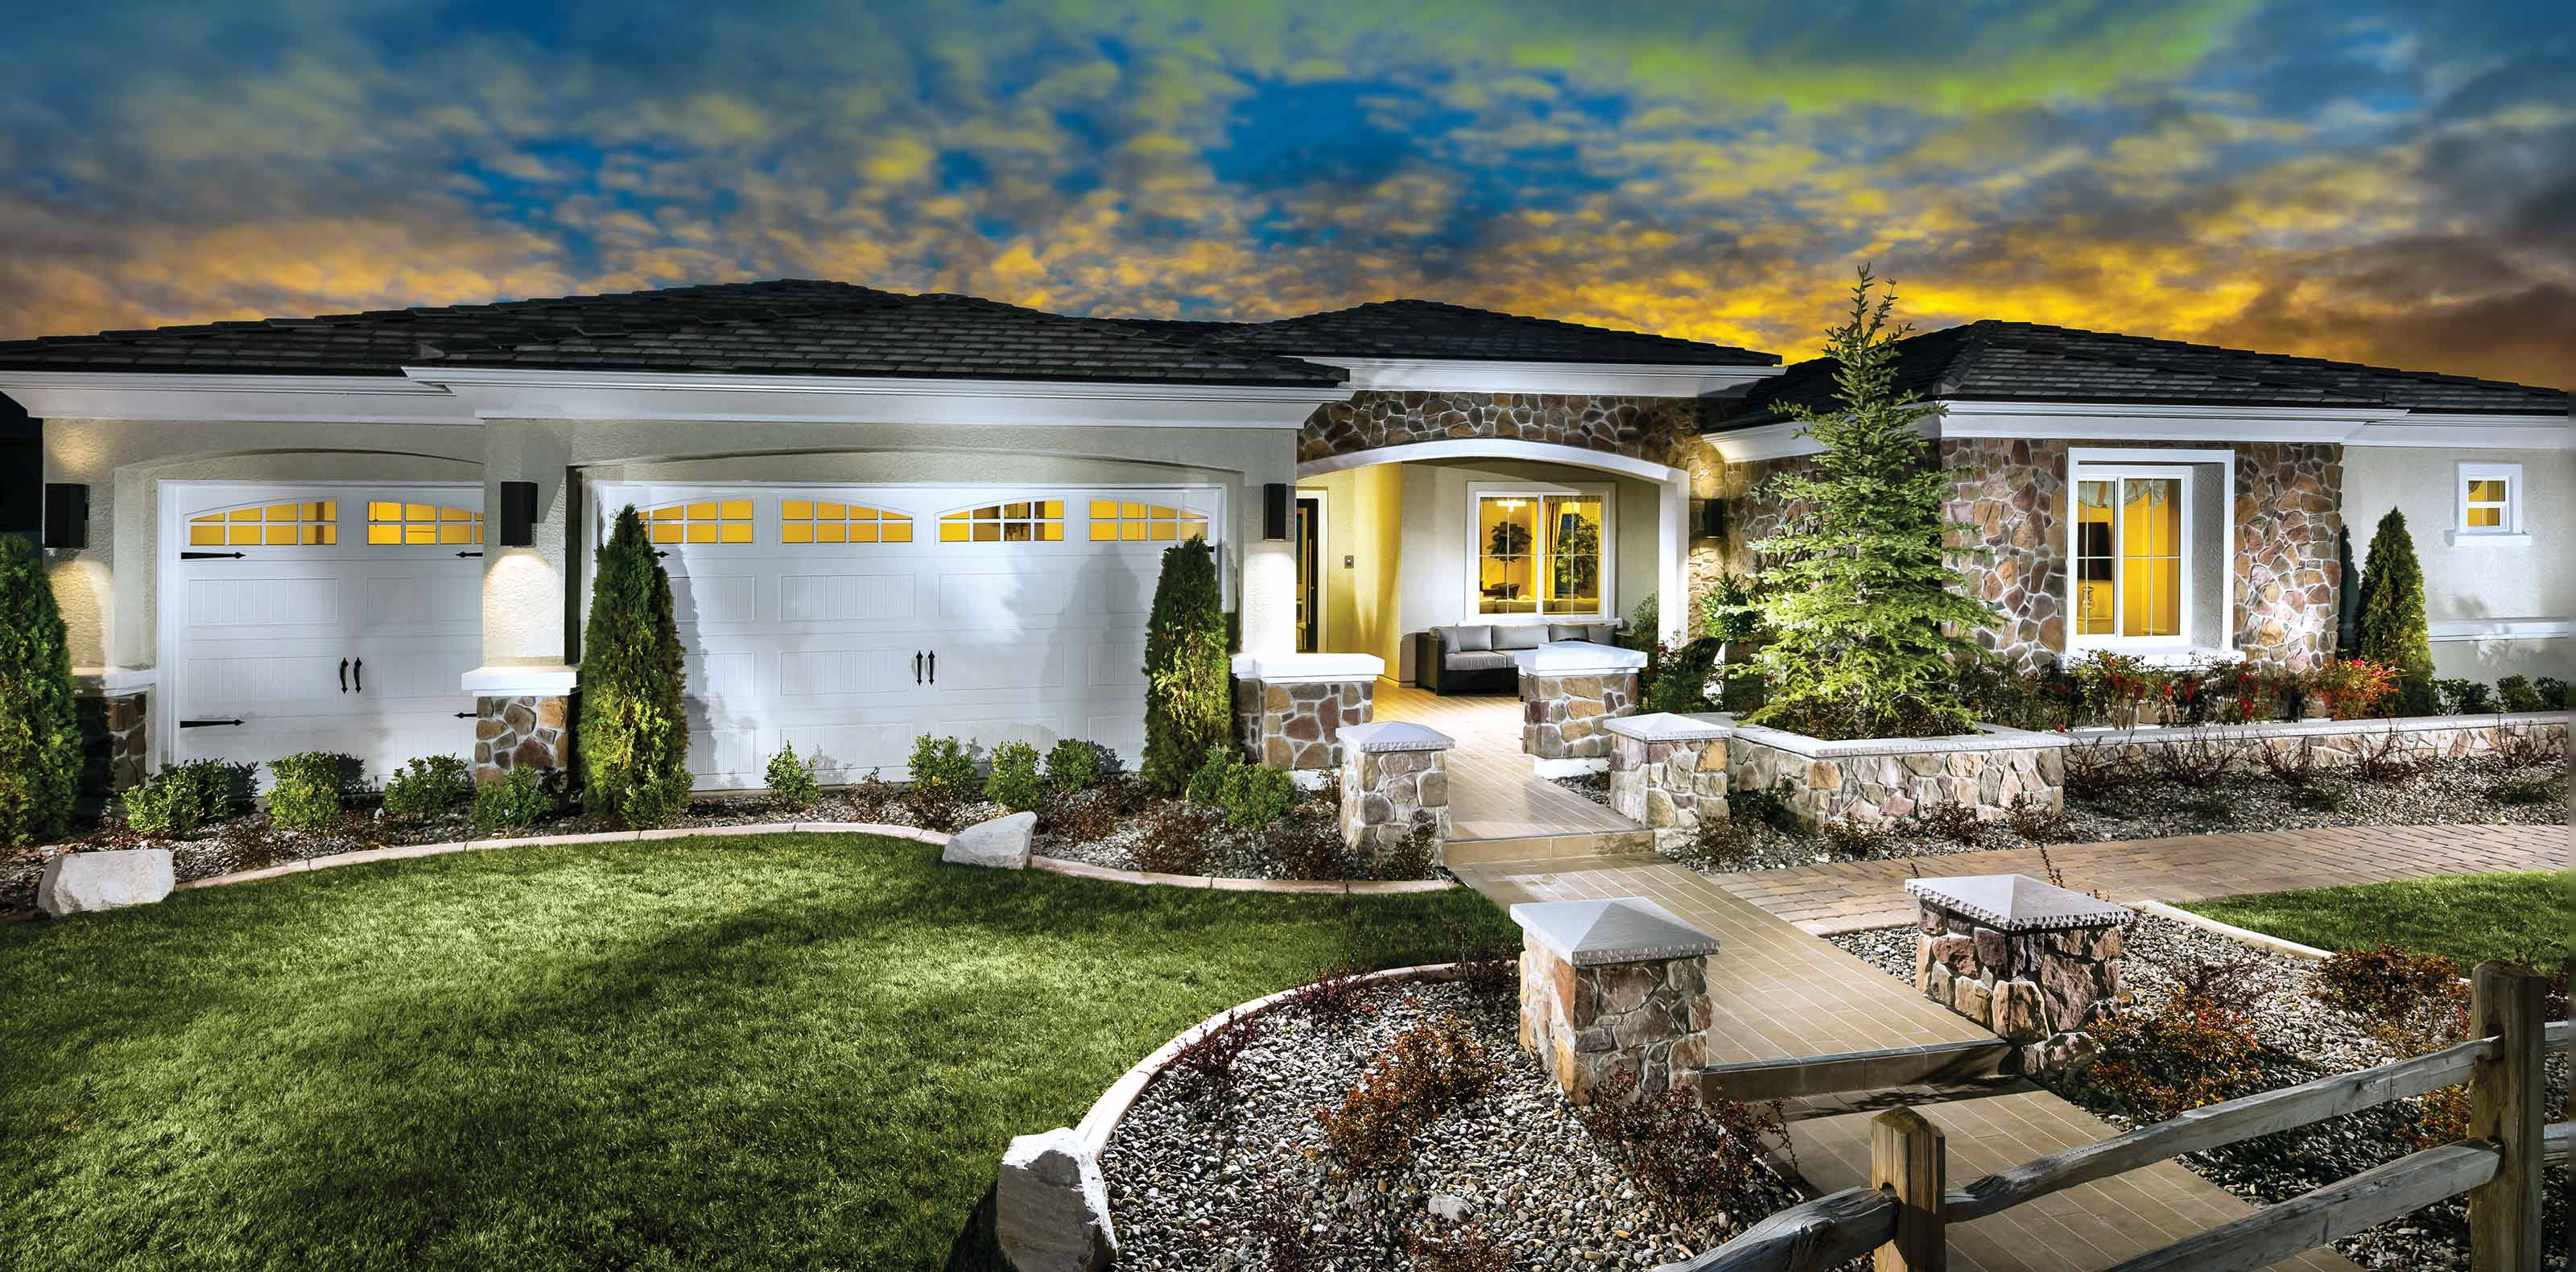 The Pendleton at Estates at Saddle Ridge in Reno Nevada